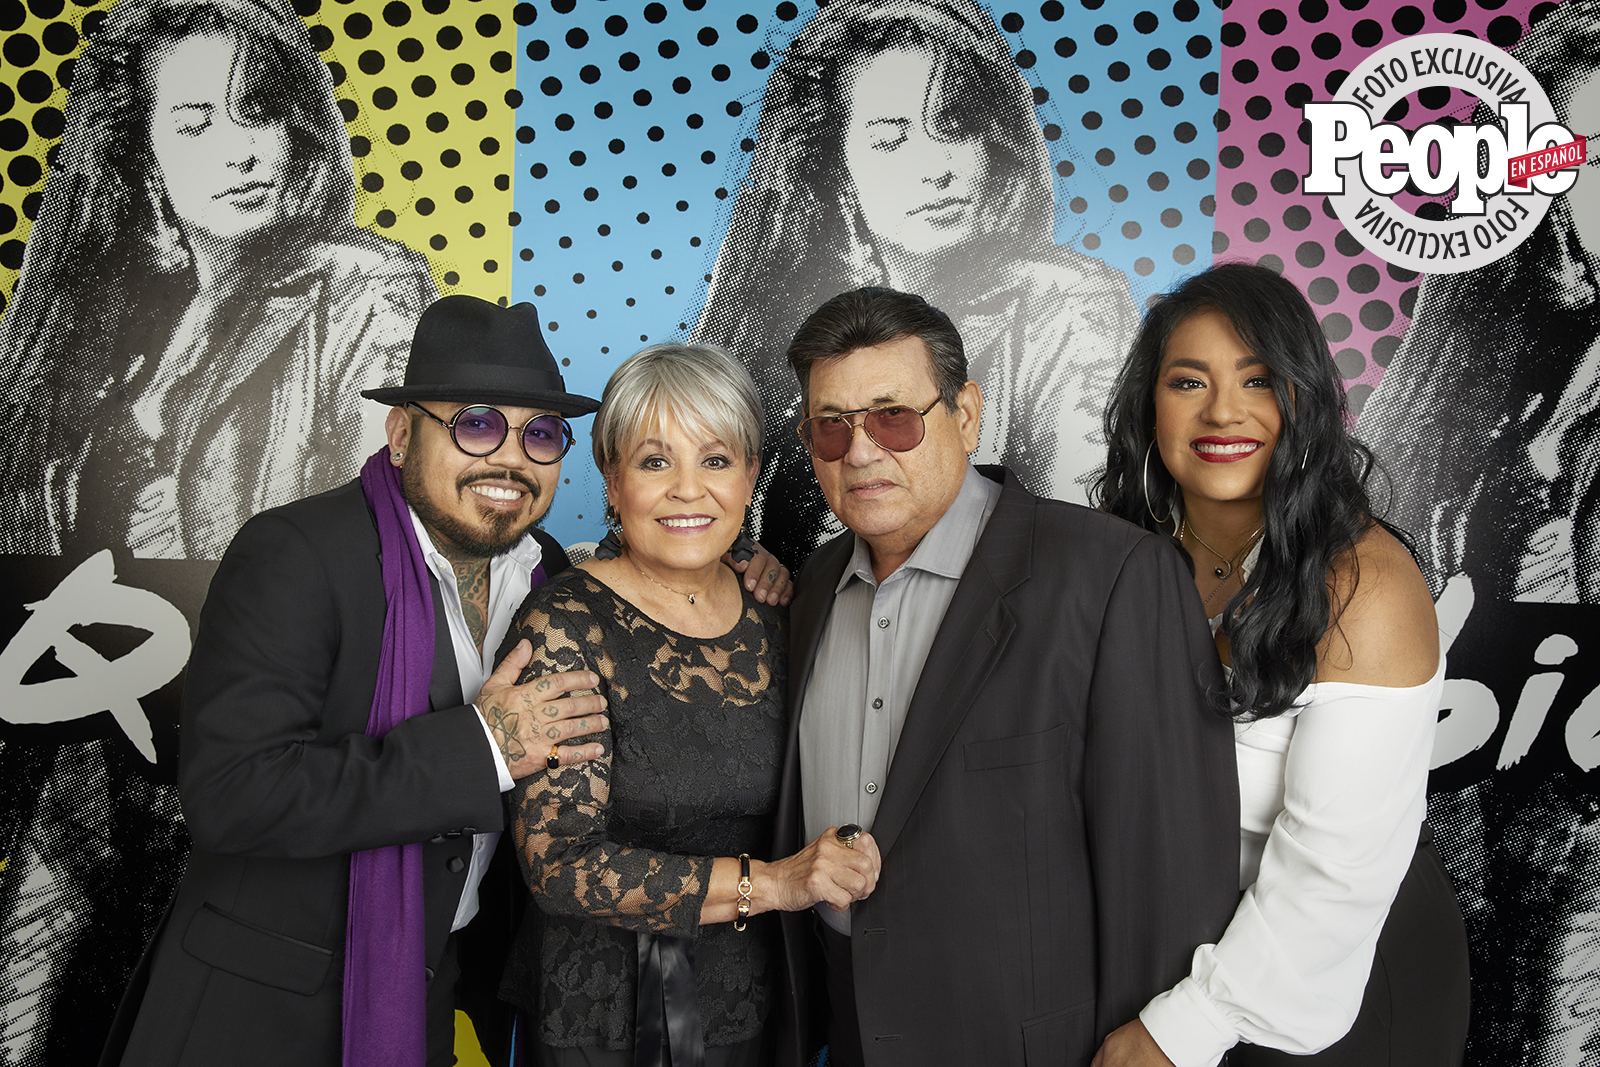 Selena familia - April 2020 cover